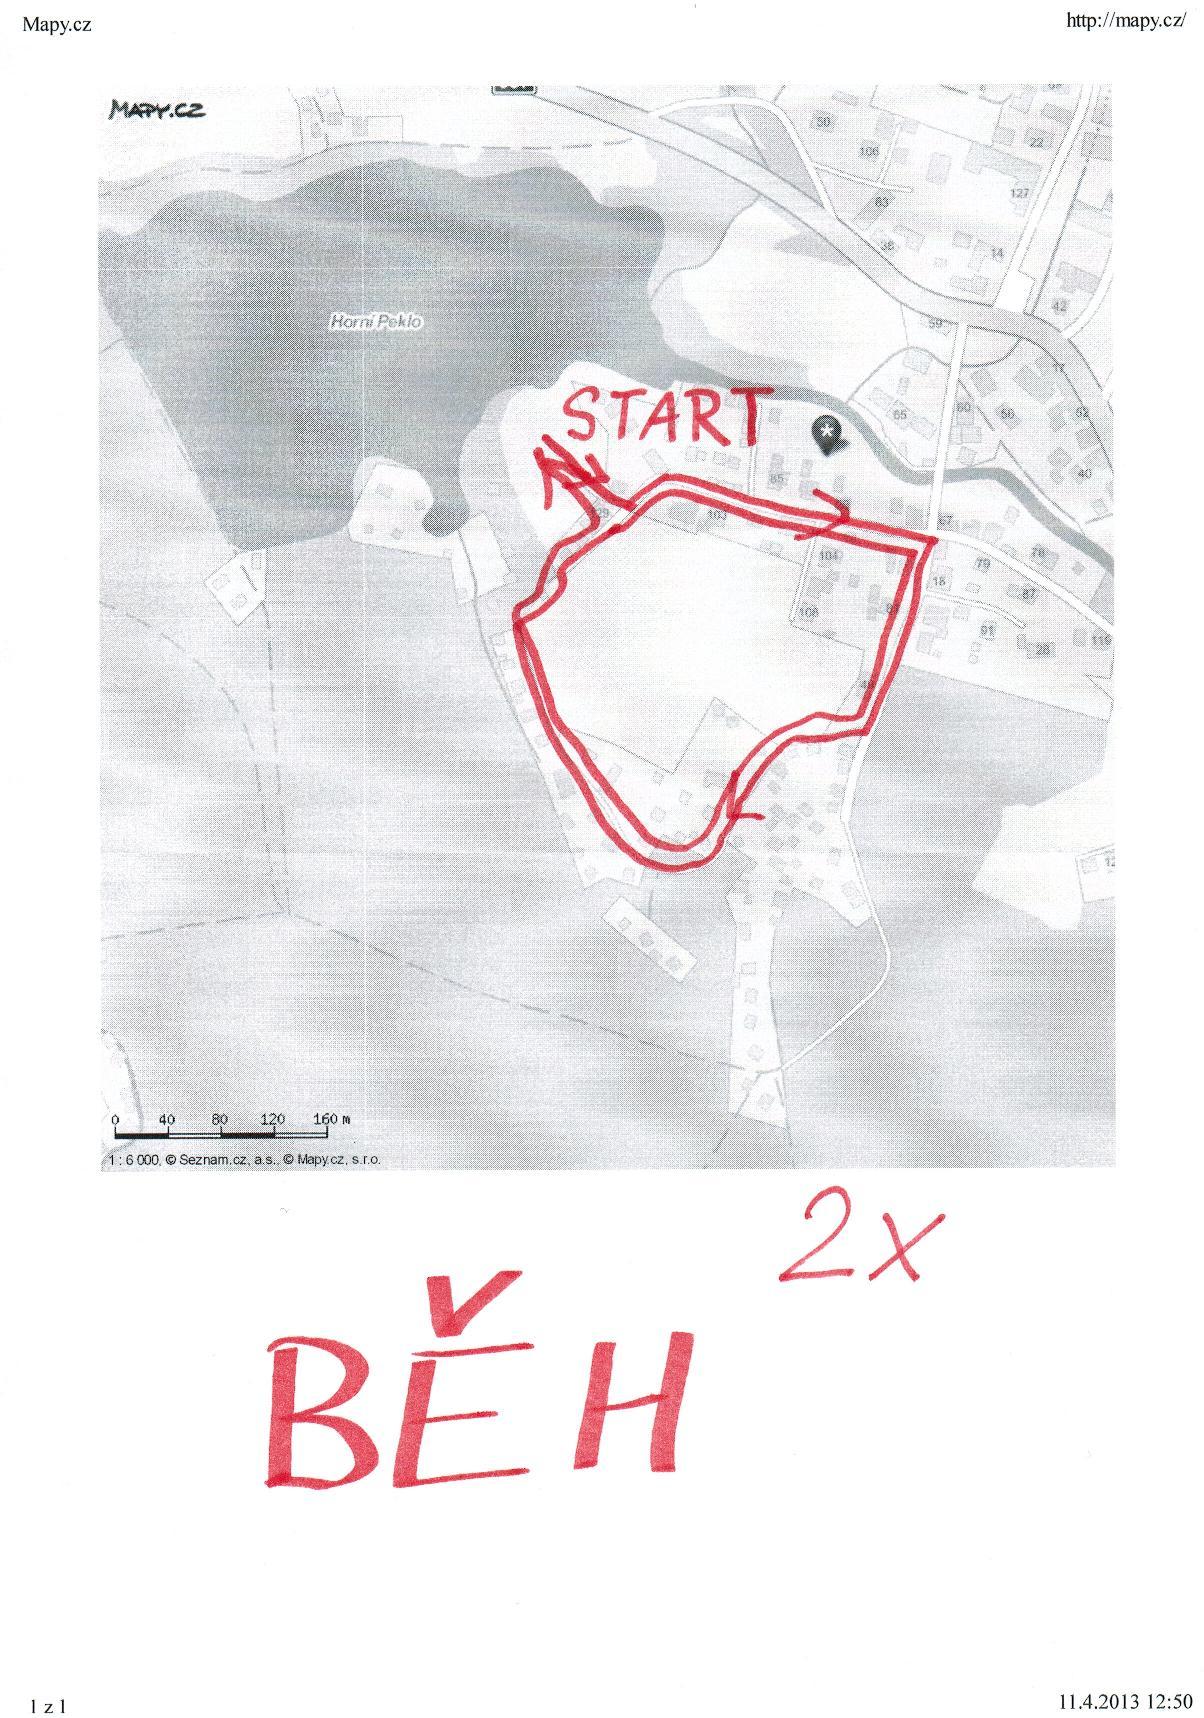 Ironman-běh-page-001 (1)